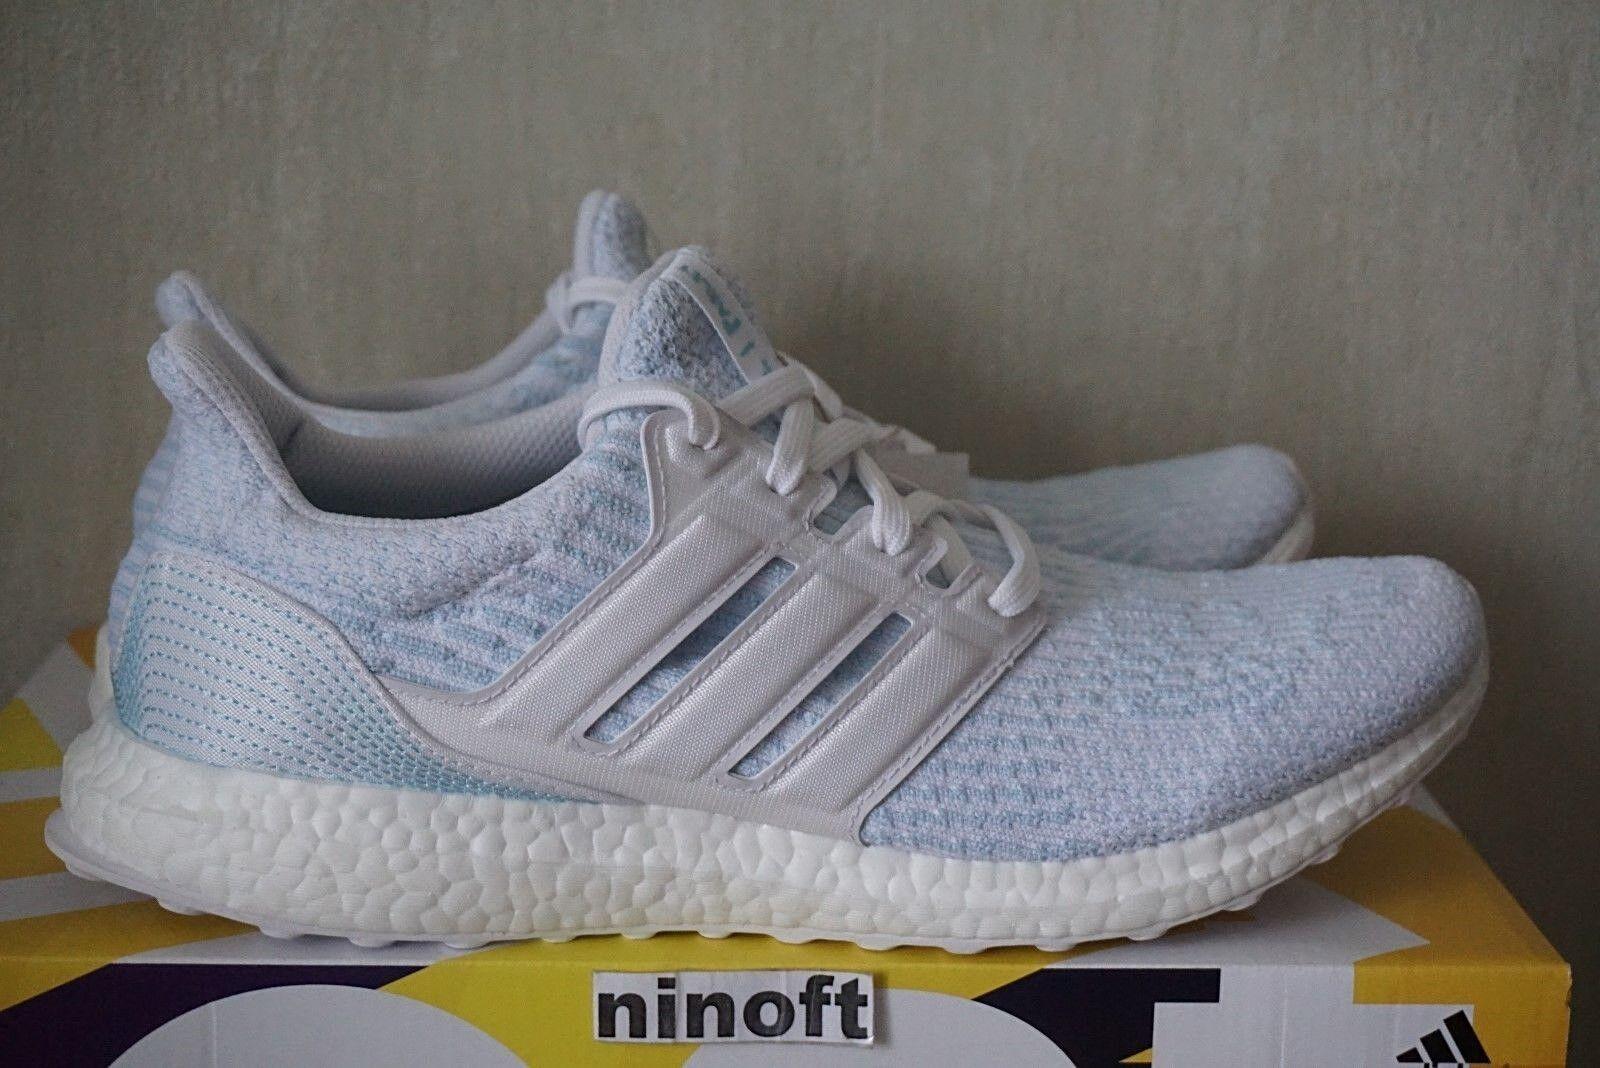 Adidas ultra cp9685 impulso 3,0 parley white lcey blu cp9685 ultra dimensioni 11,5 12,5 737f9a